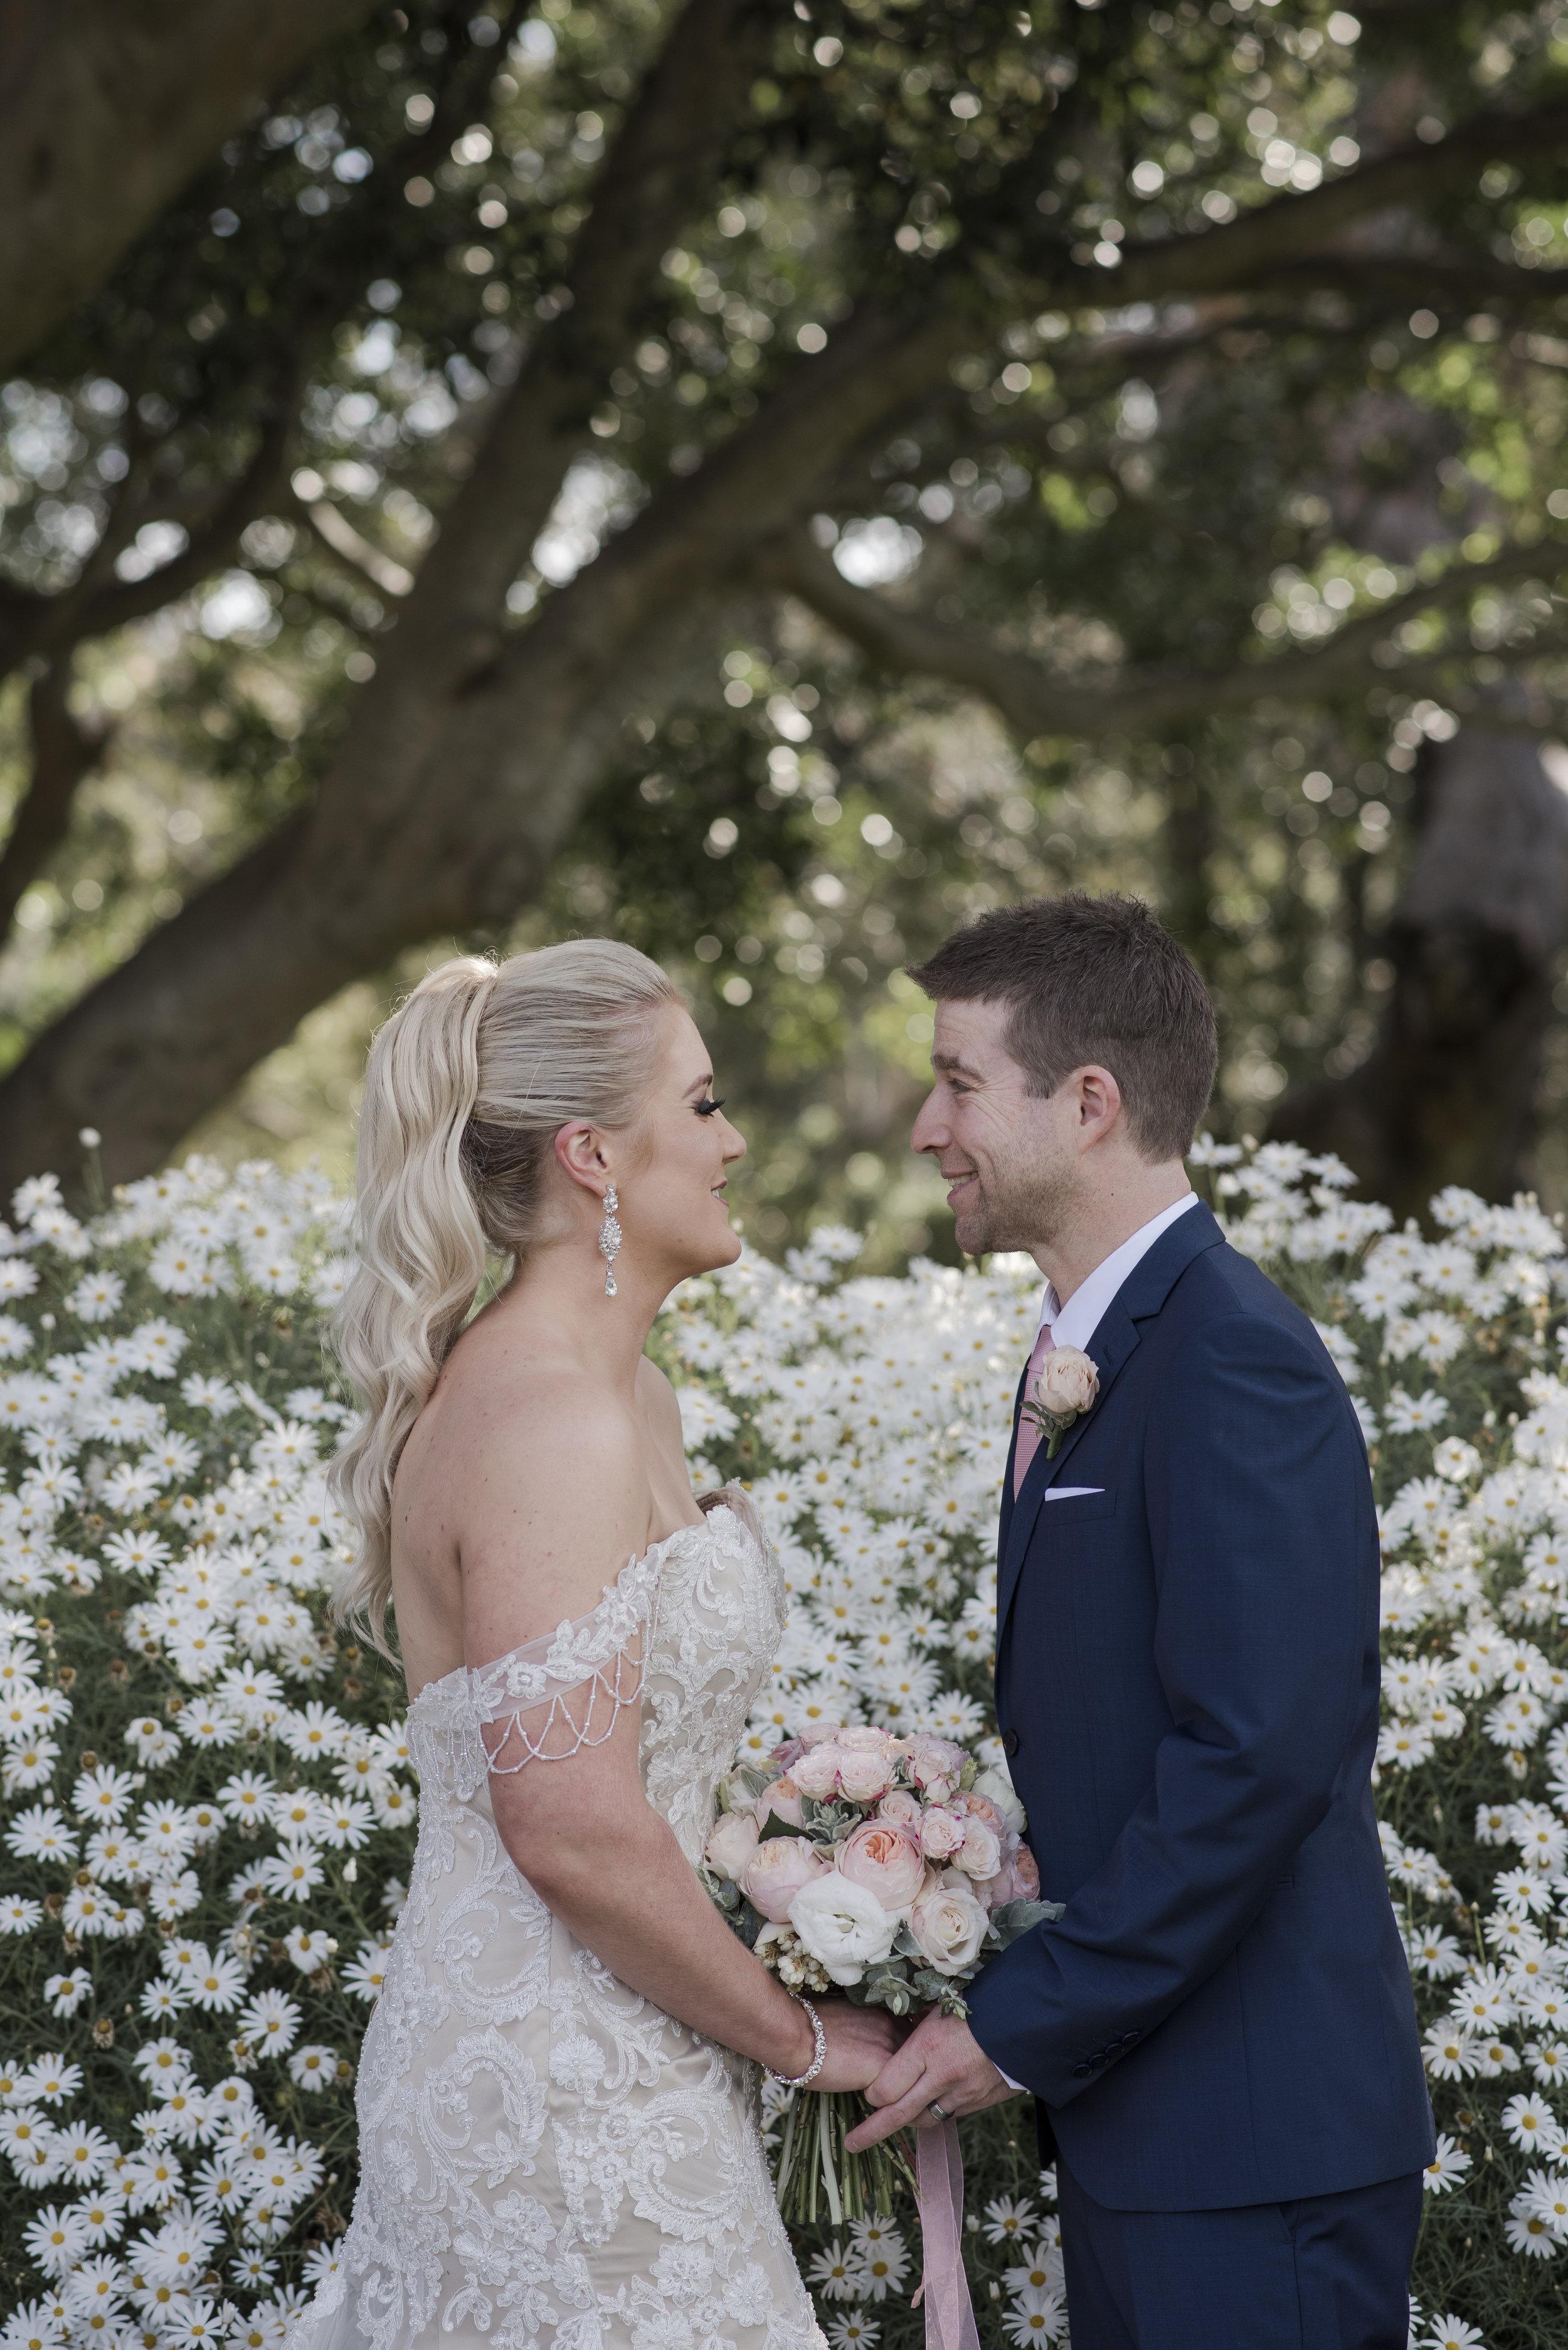 Teagan_Mayflower Weddings Photography_047.jpg